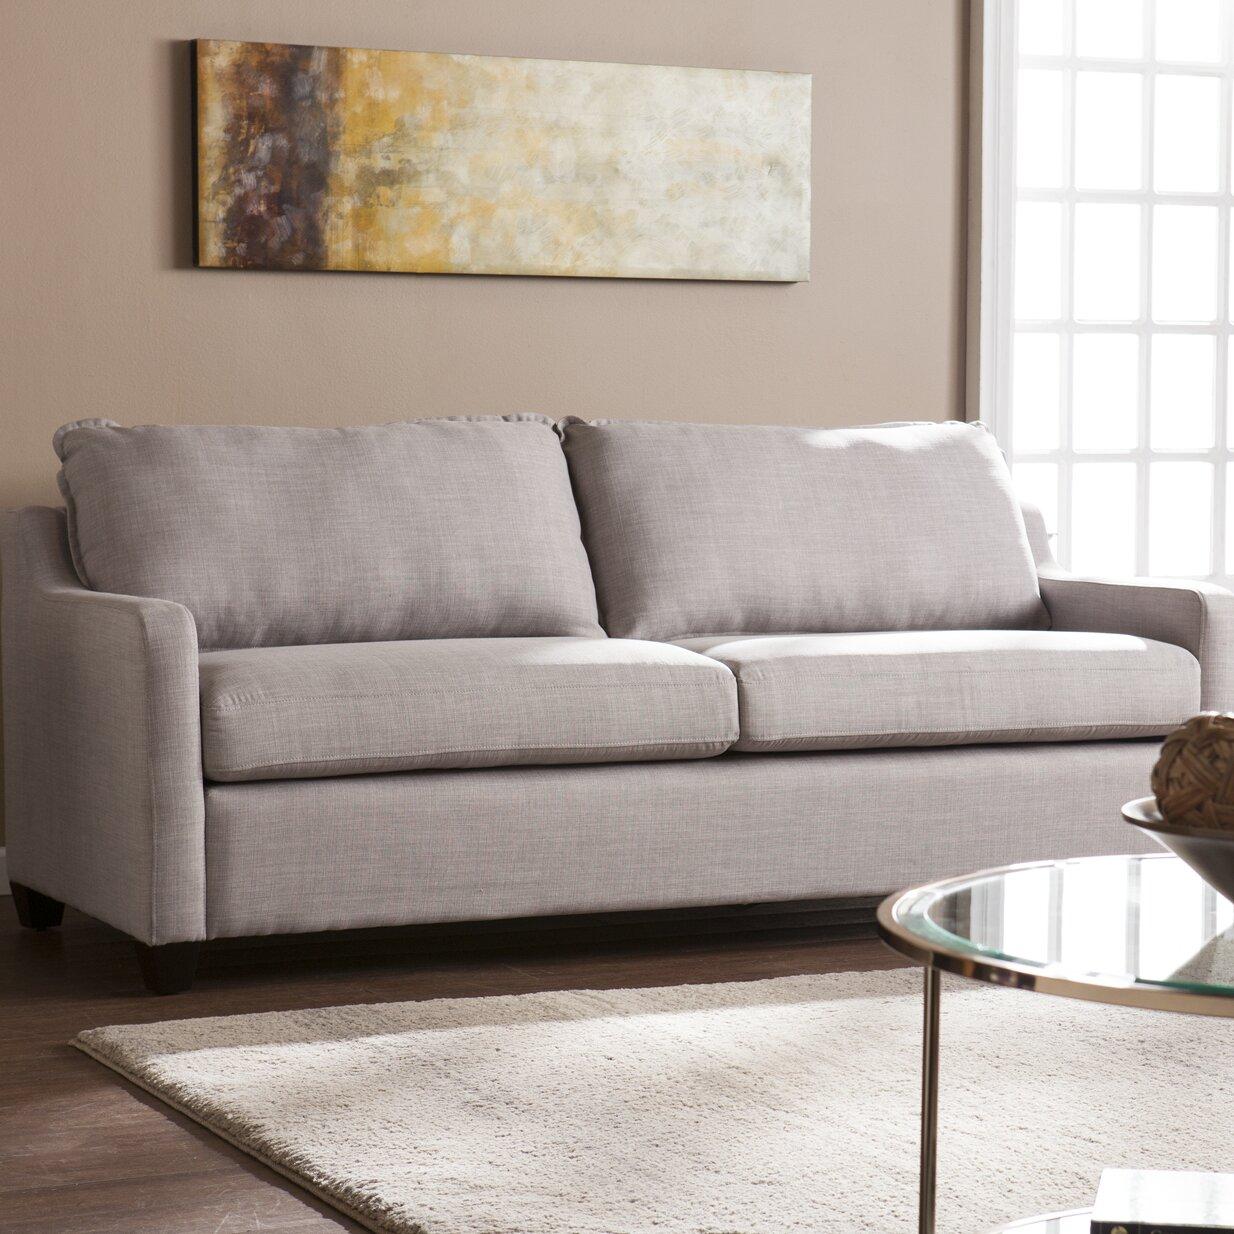 Darby Home Co Raynor Sofa Reviews Wayfair